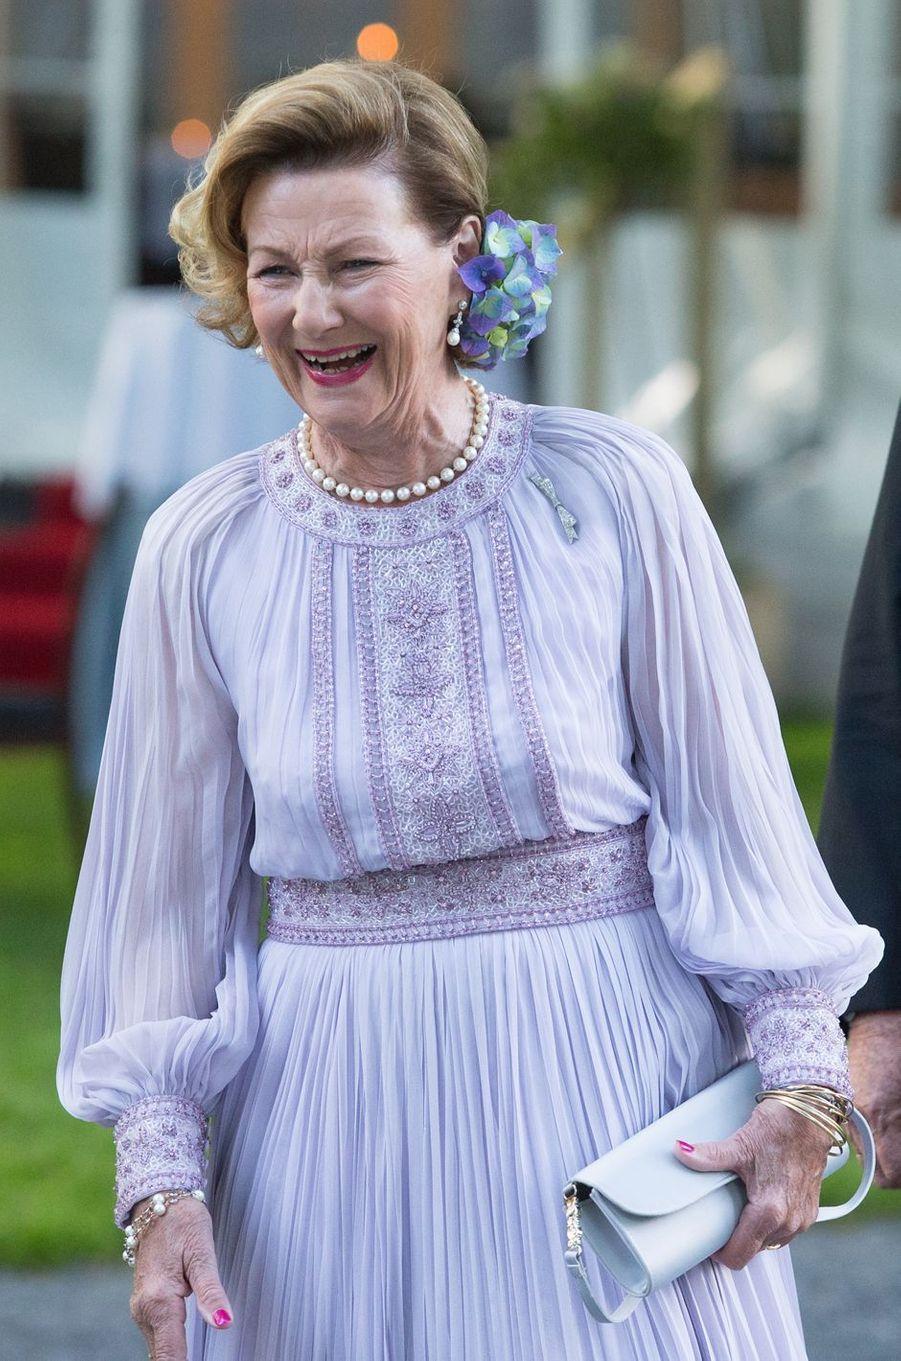 La reine Sonja de Norvège à Oslo, le 4 juillet 2017